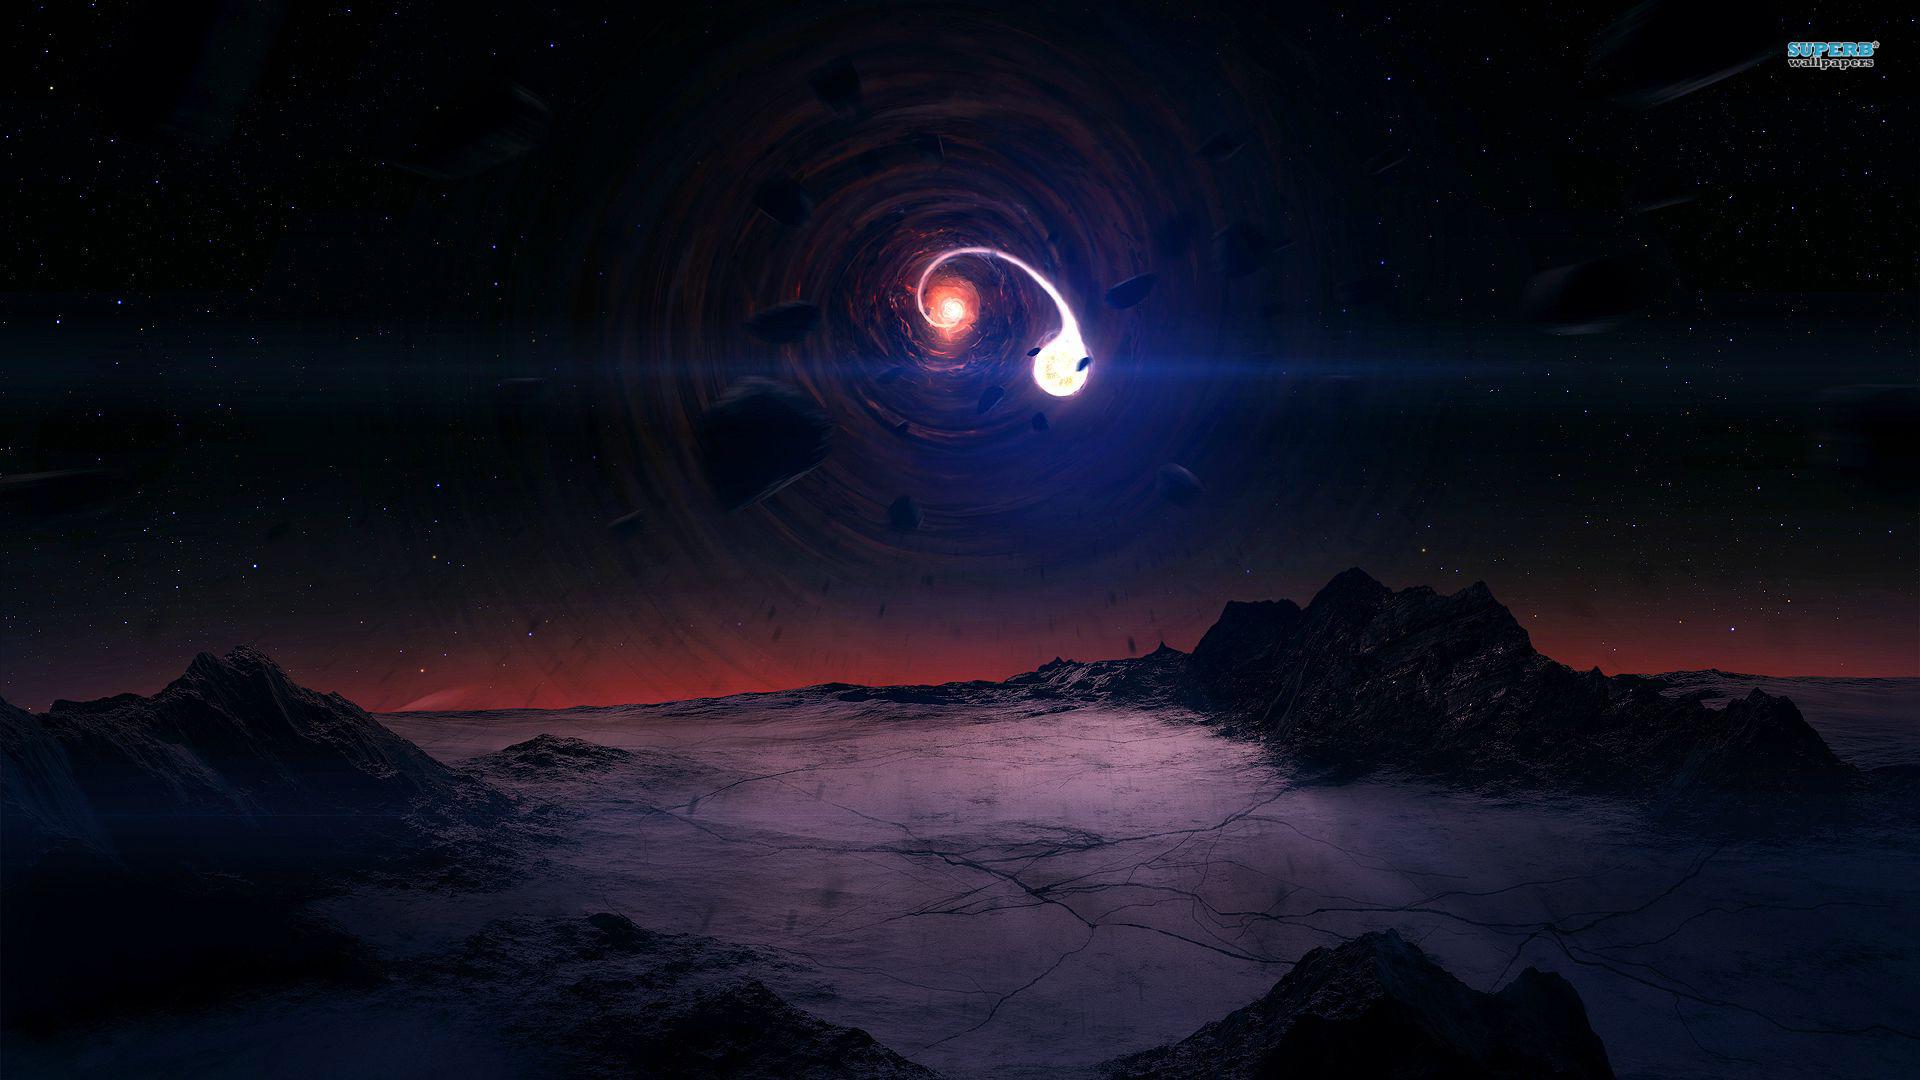 Black Hole Wallpaper HD - WallpaperSafari